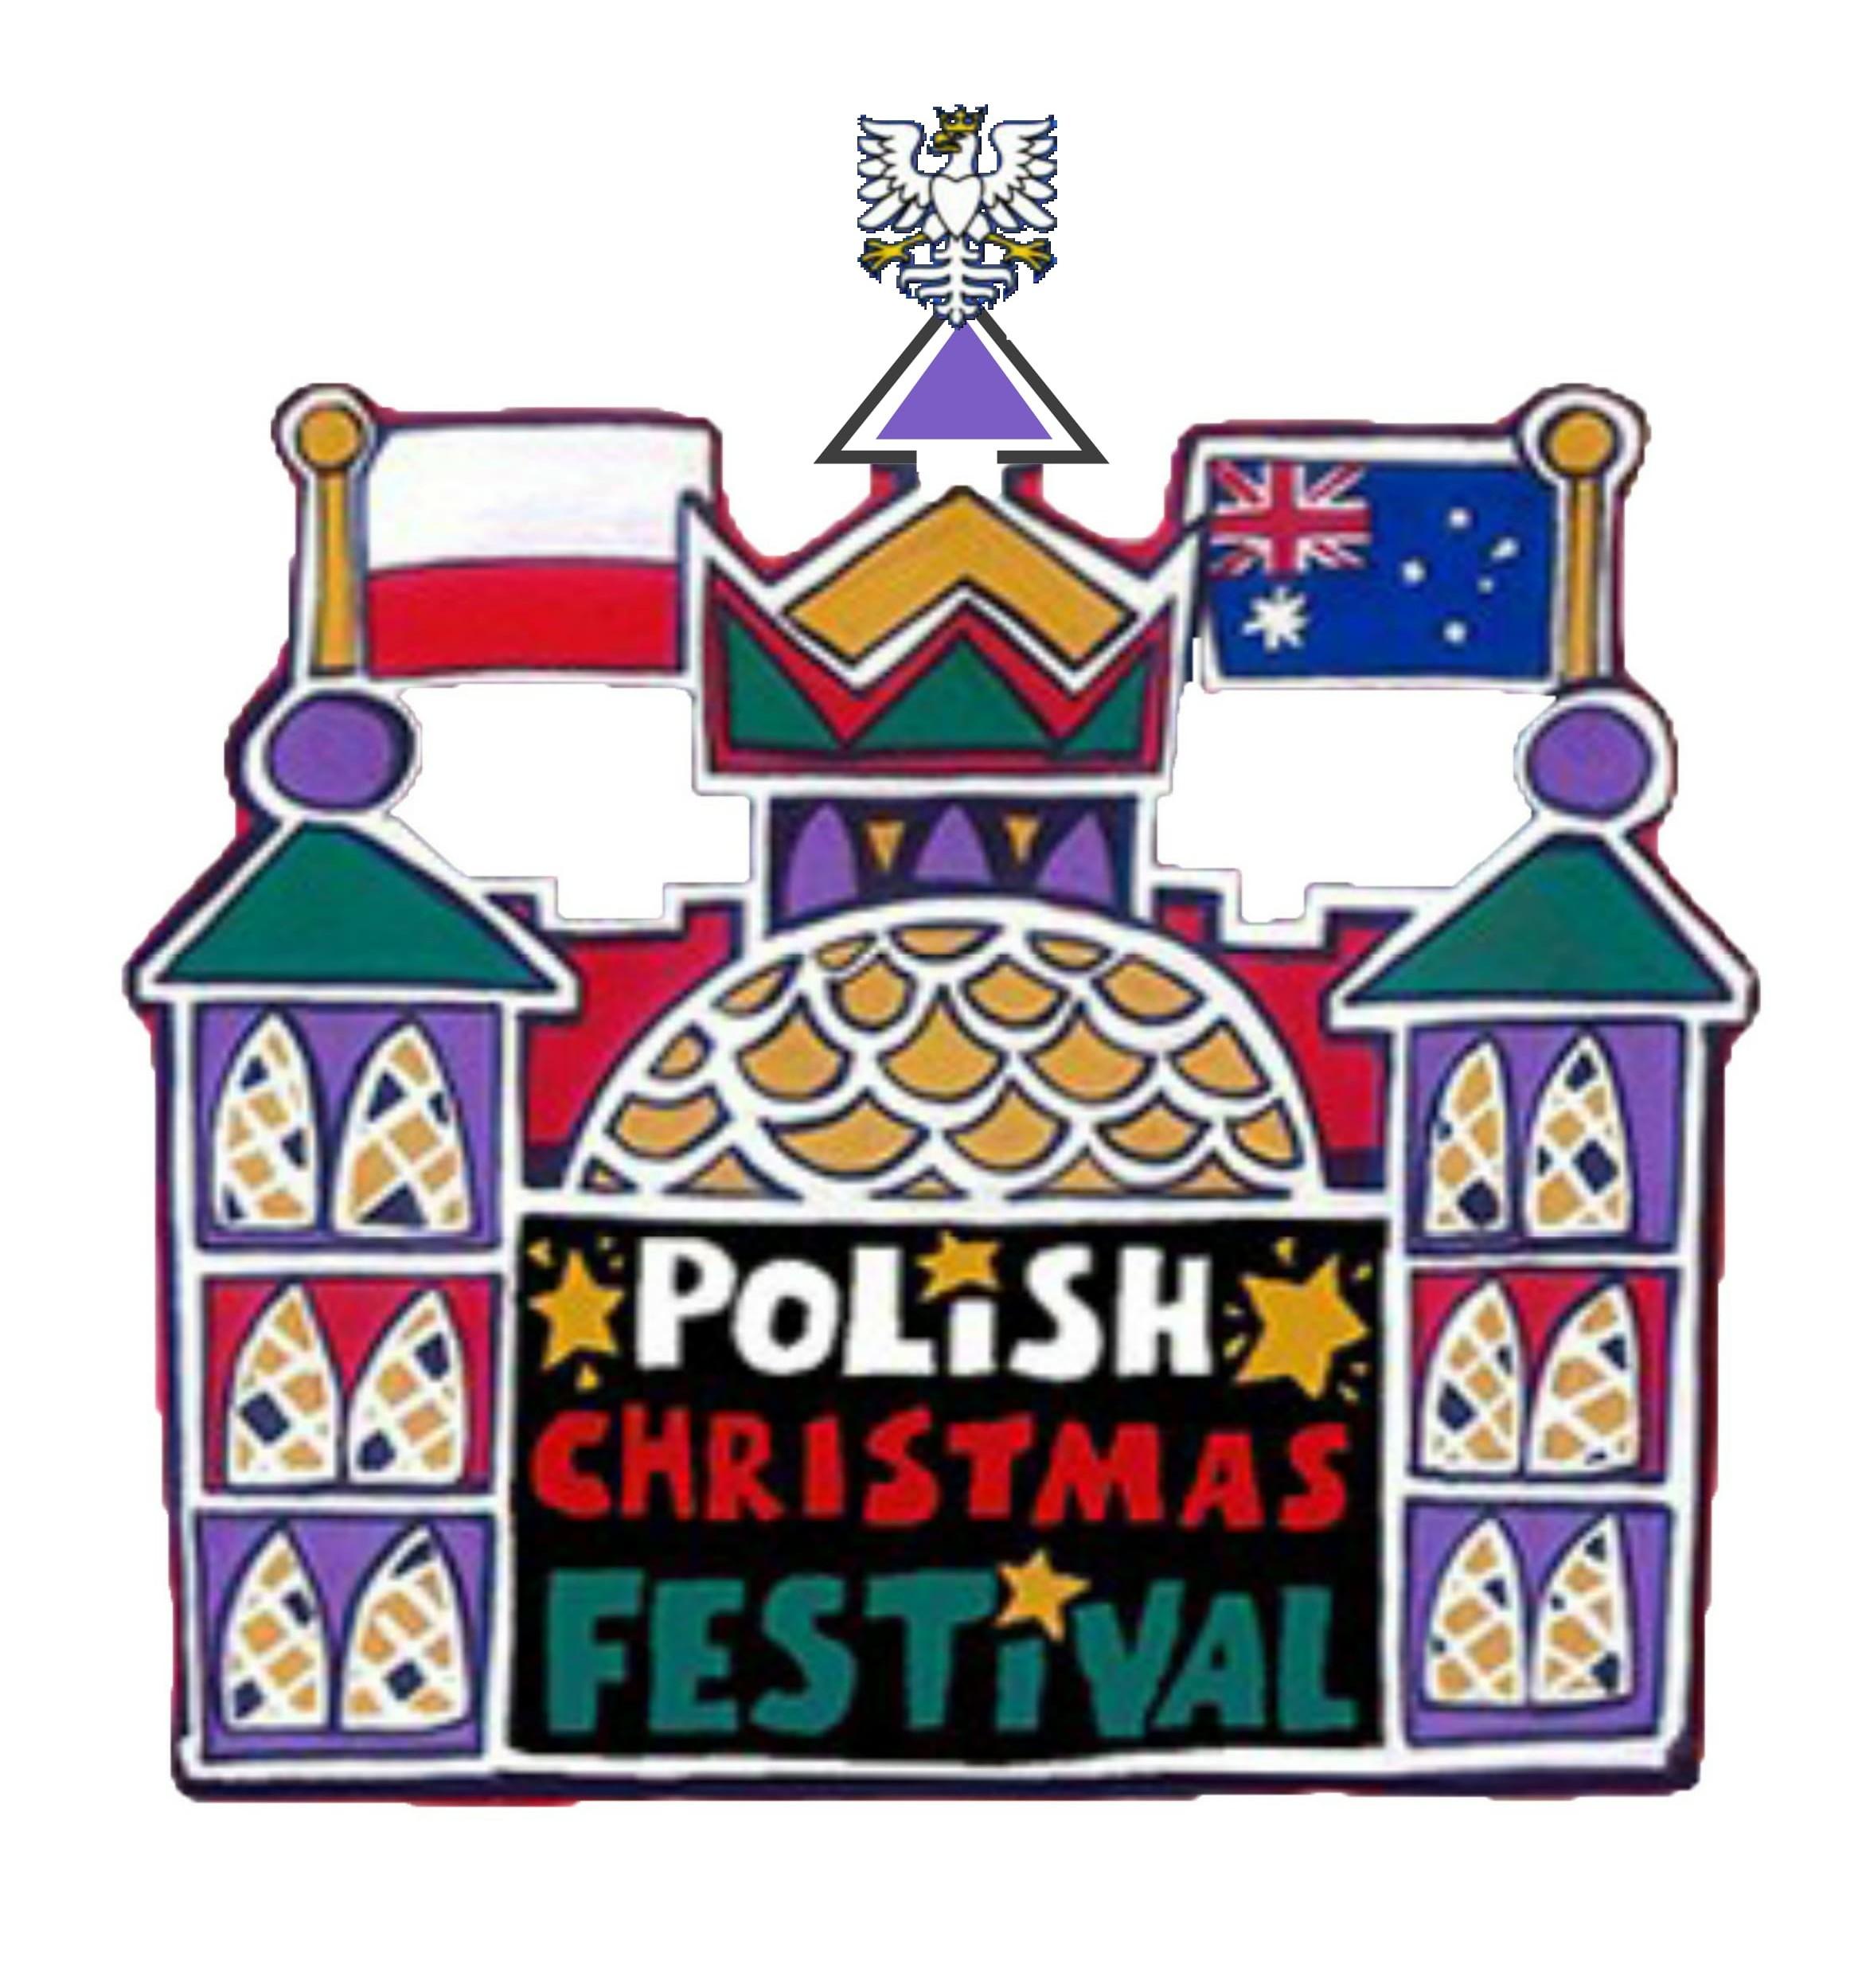 Polish Christmas Festival.